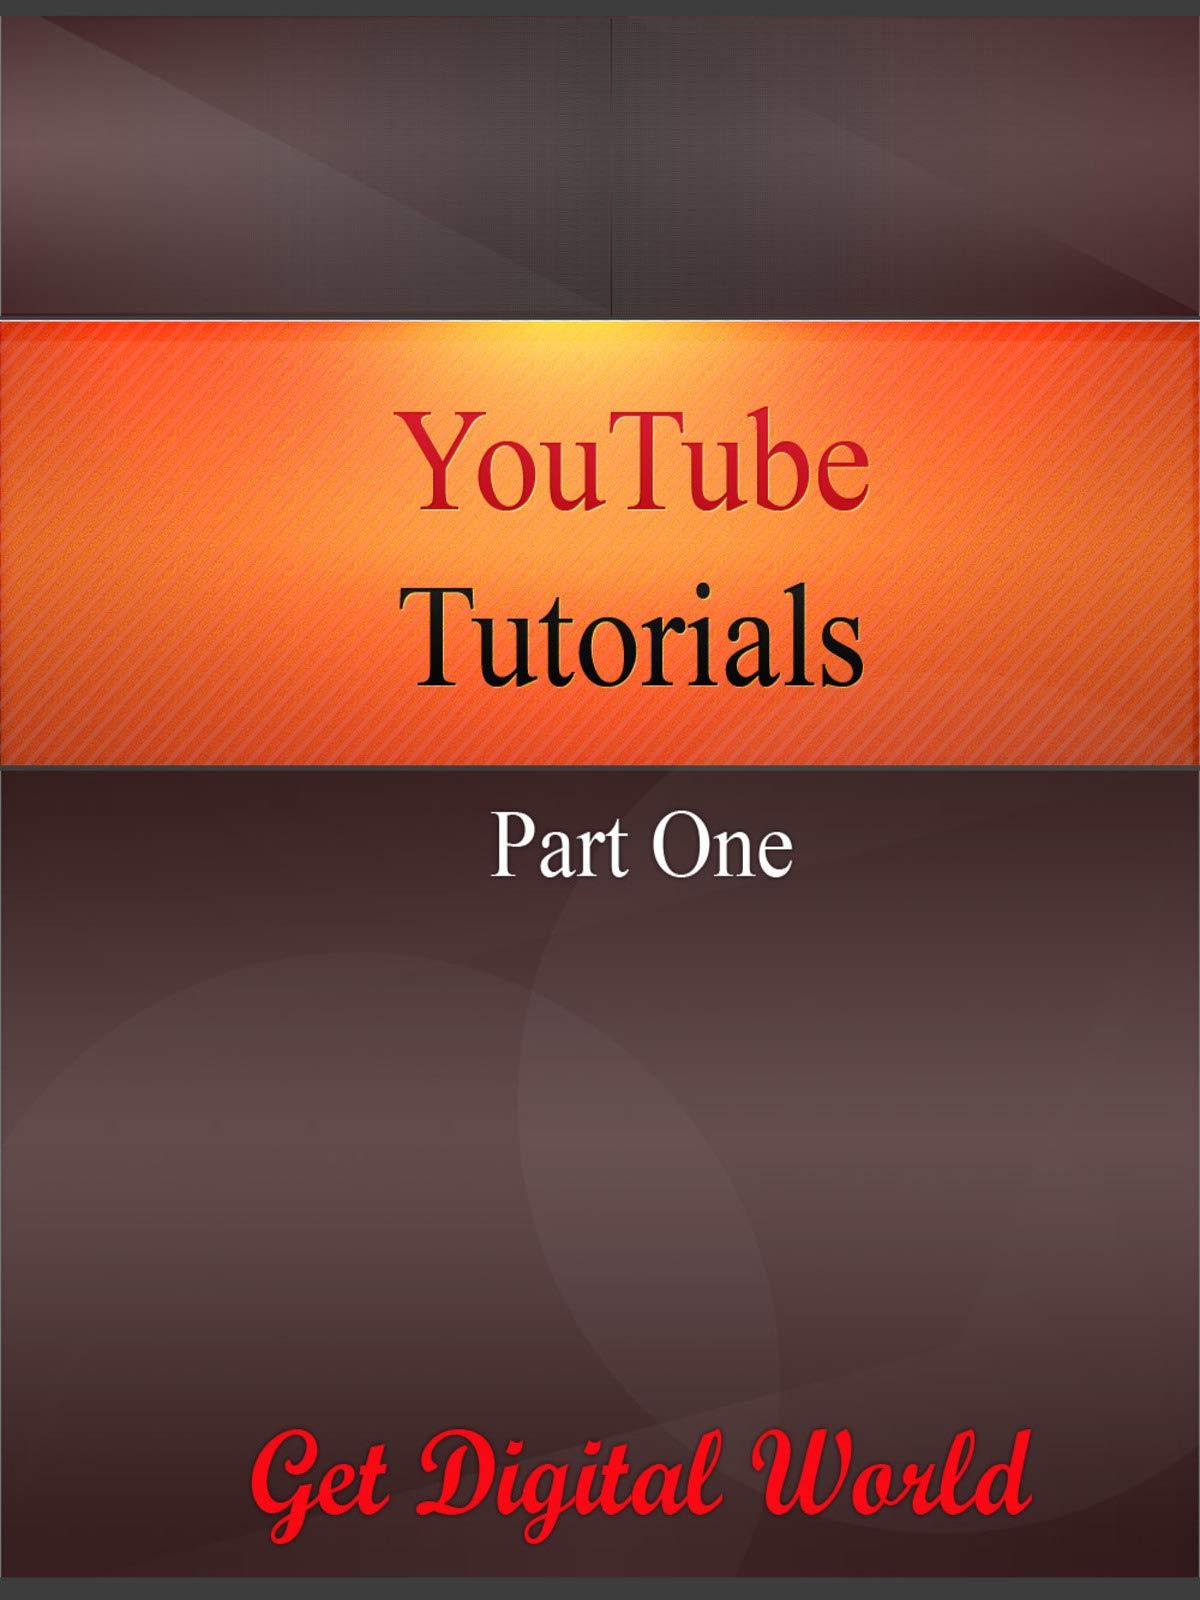 YouTube Tutorials Part One